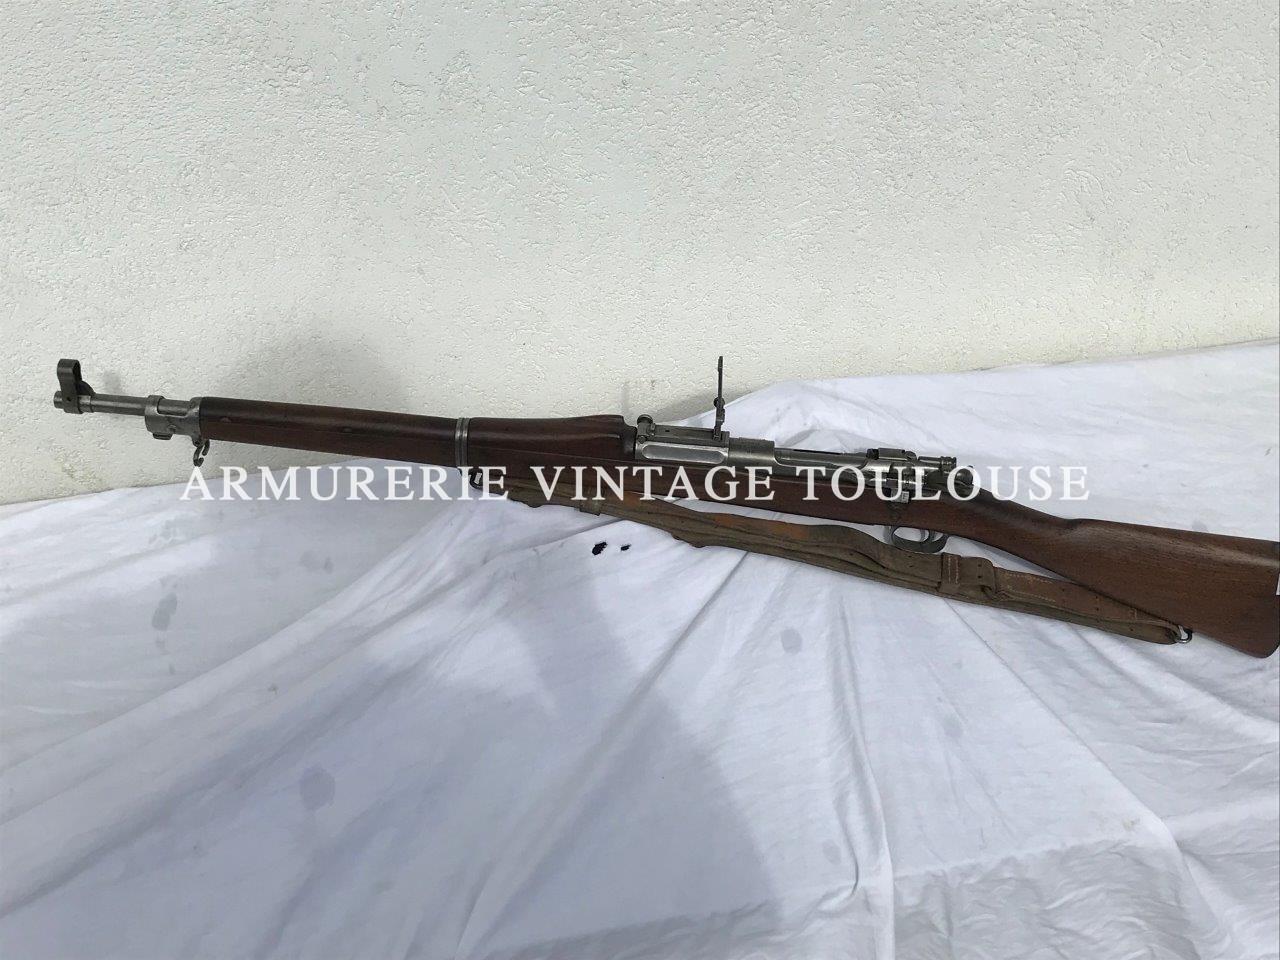 Fusil Springfield 1903 calibre 30/06 fabrication Août 1917